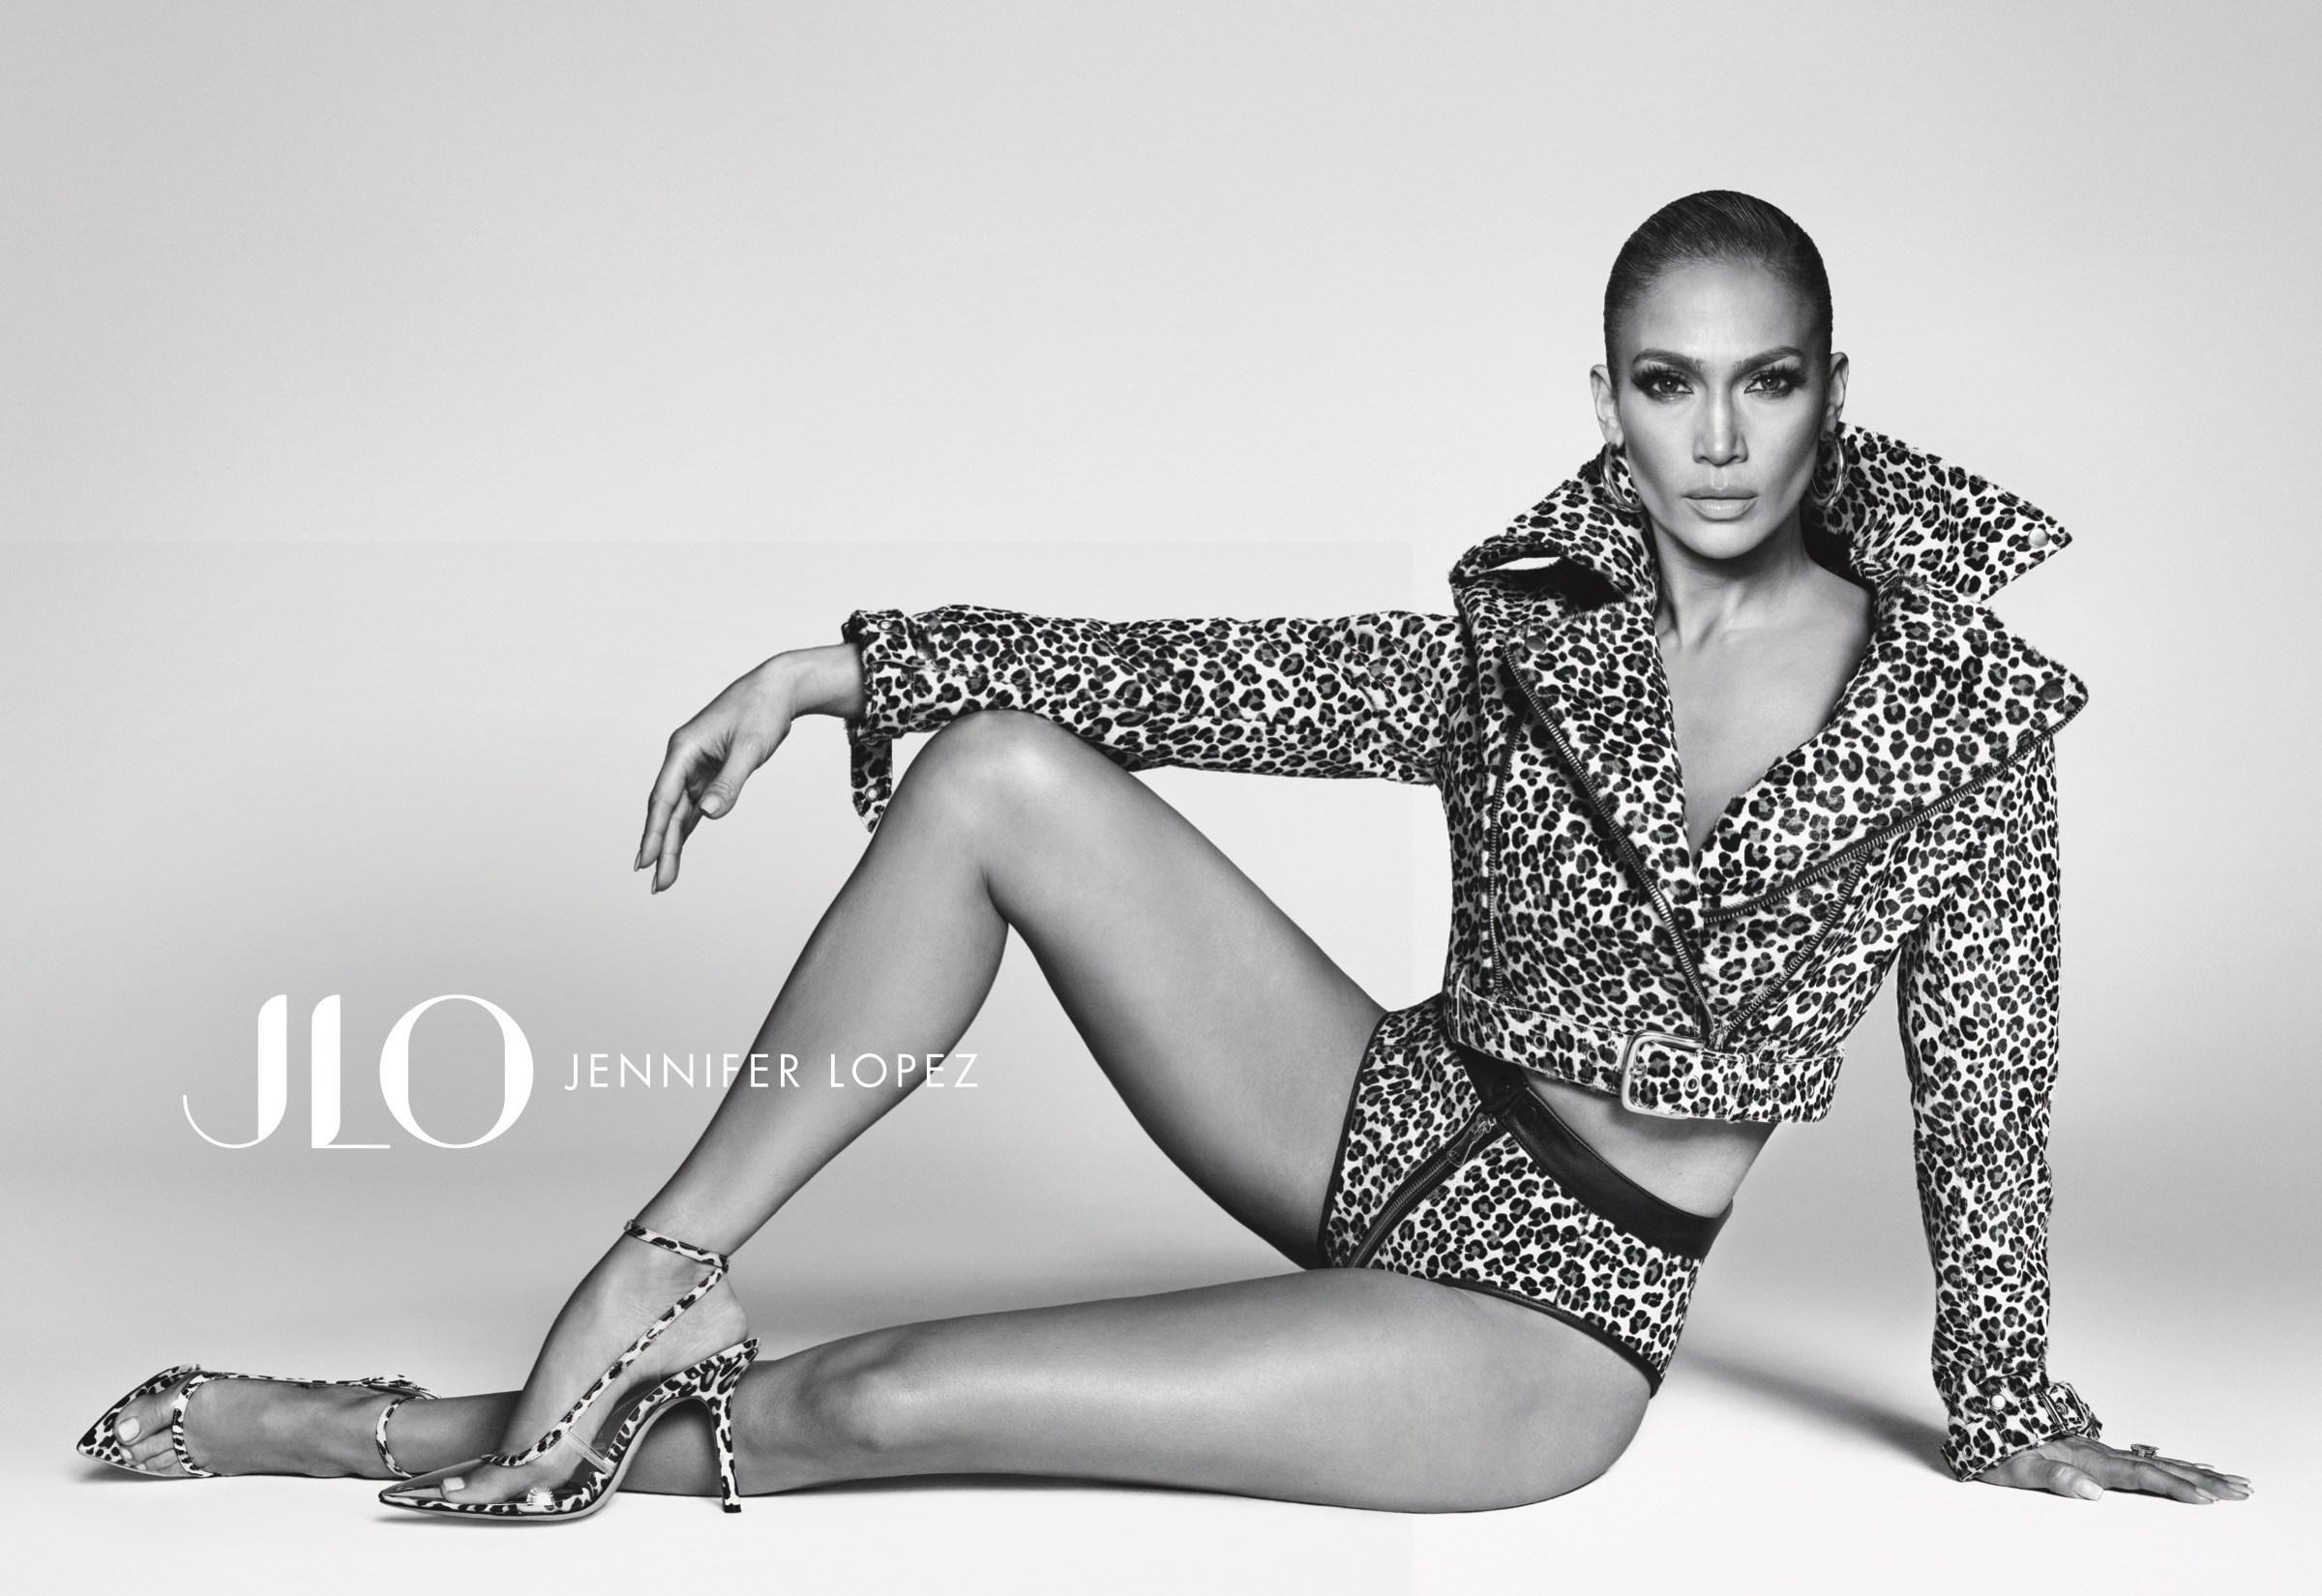 Tin thời trang về BST JLO JENNIFER LOPEZ của ca sĩ Jennifer Lopez